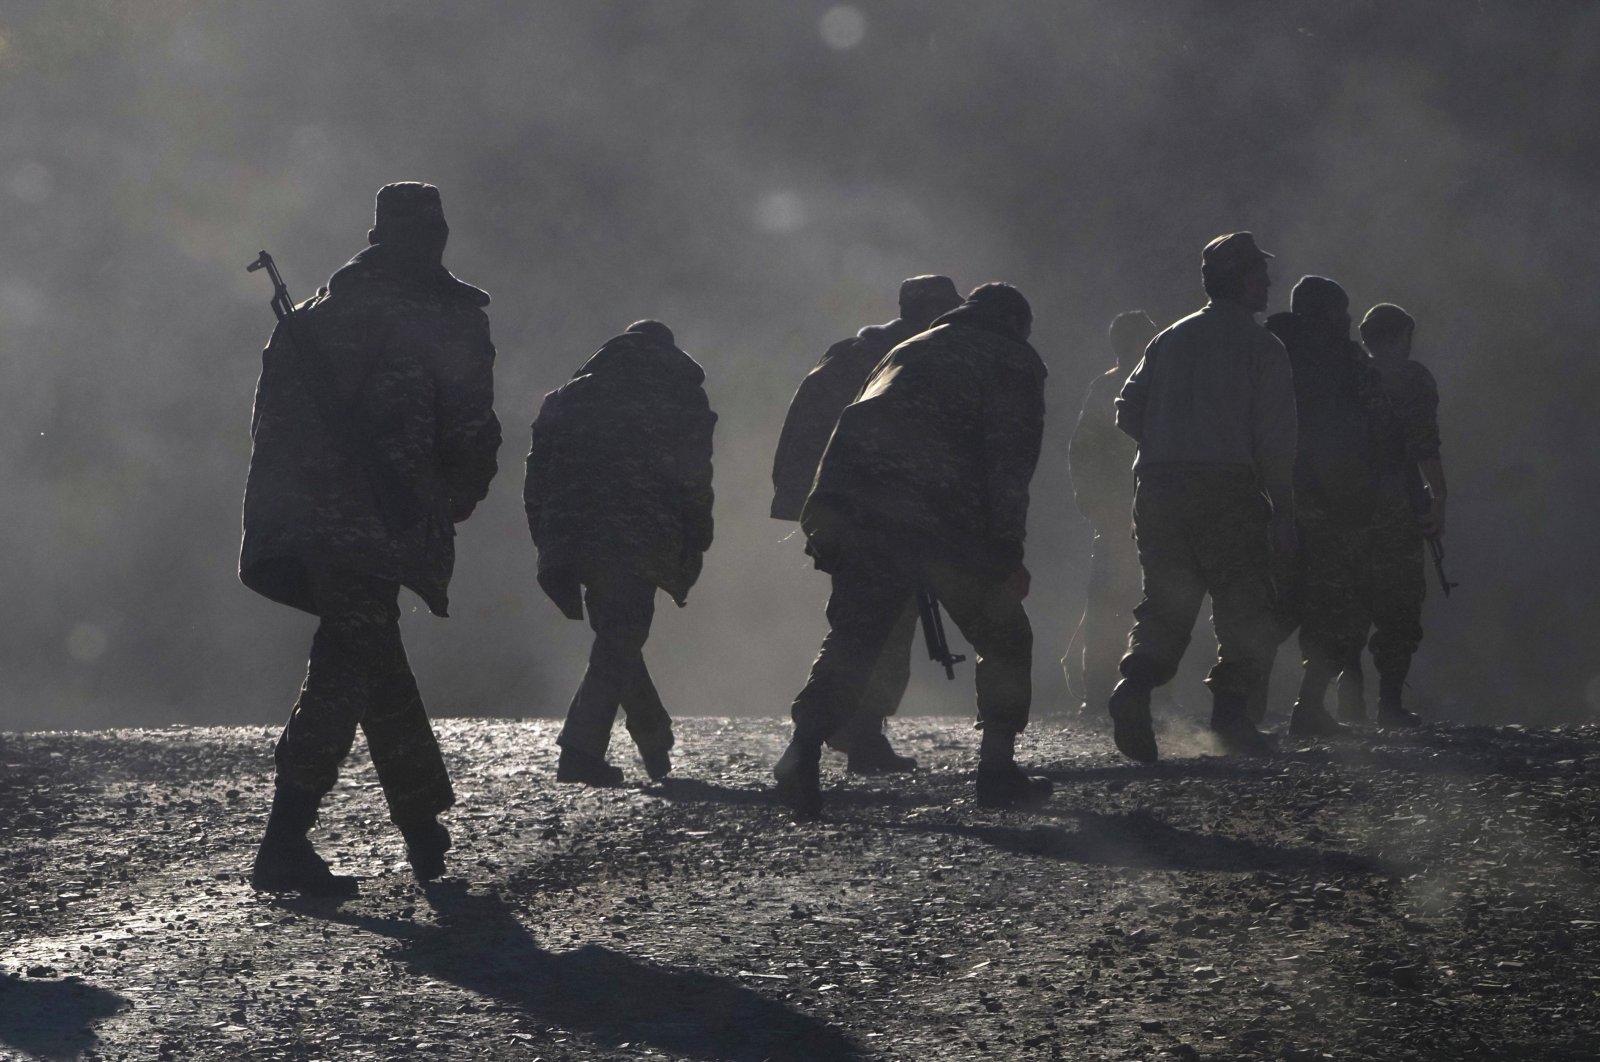 Armenian soldiers walk along the road near the border between Nagorno-Karabakh and Armenia, Sunday, Nov. 8, 2020. (AP Photo)